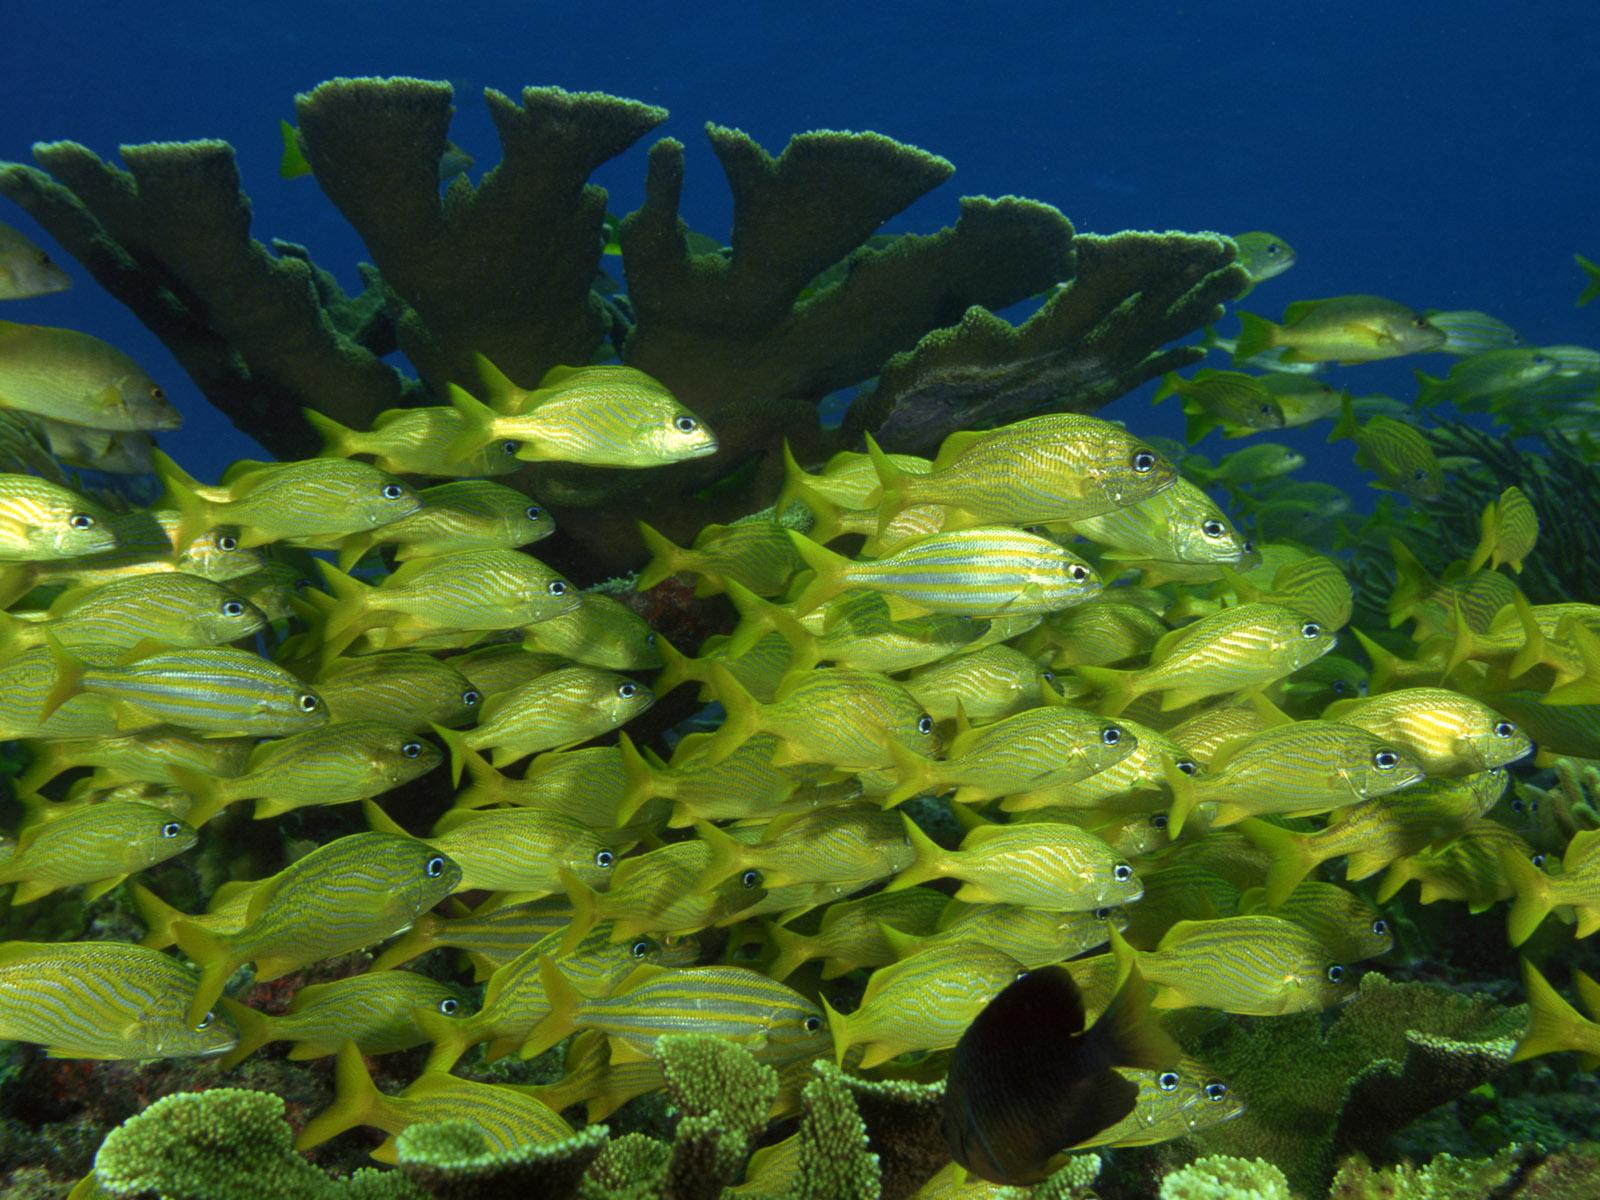 https://1.bp.blogspot.com/-6XpunULfpL4/Tg29N2866FI/AAAAAAAAA9w/S_isY_mtkls/s1600/Underwater%2BWallpaper%2B%25252838%252529.jpg